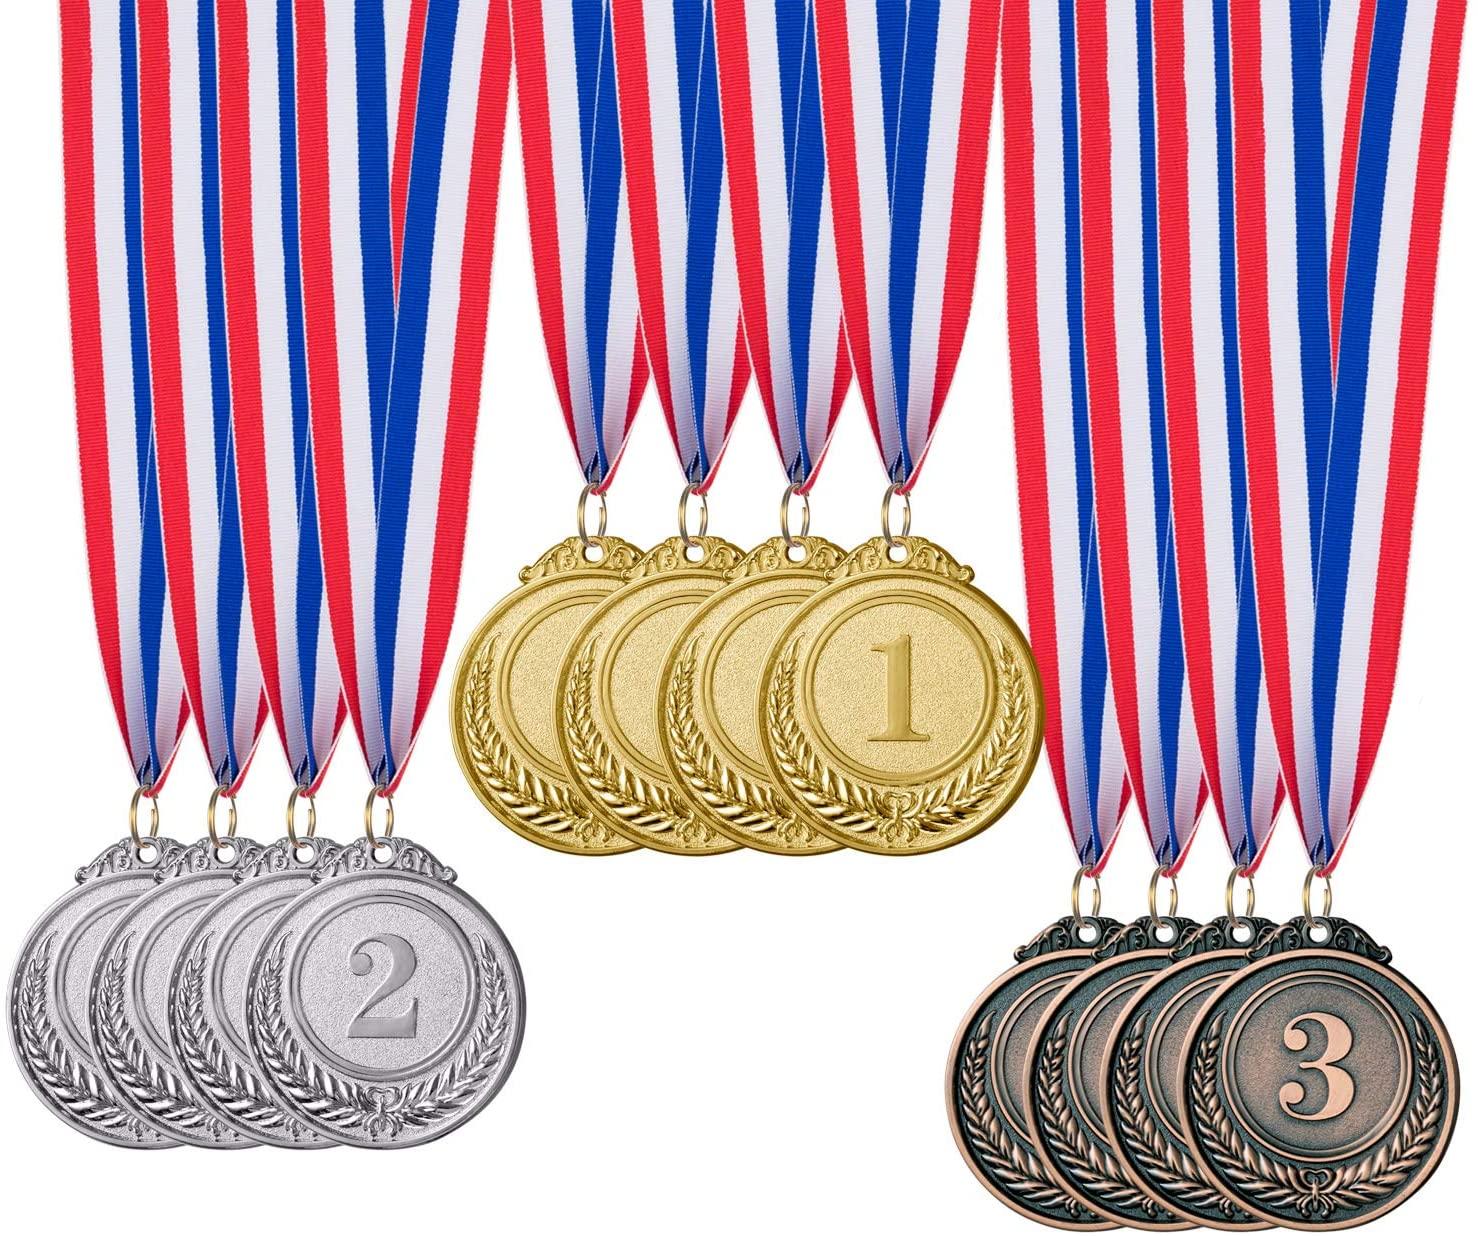 12 Pieces Gold Silver Bronze Award Medals